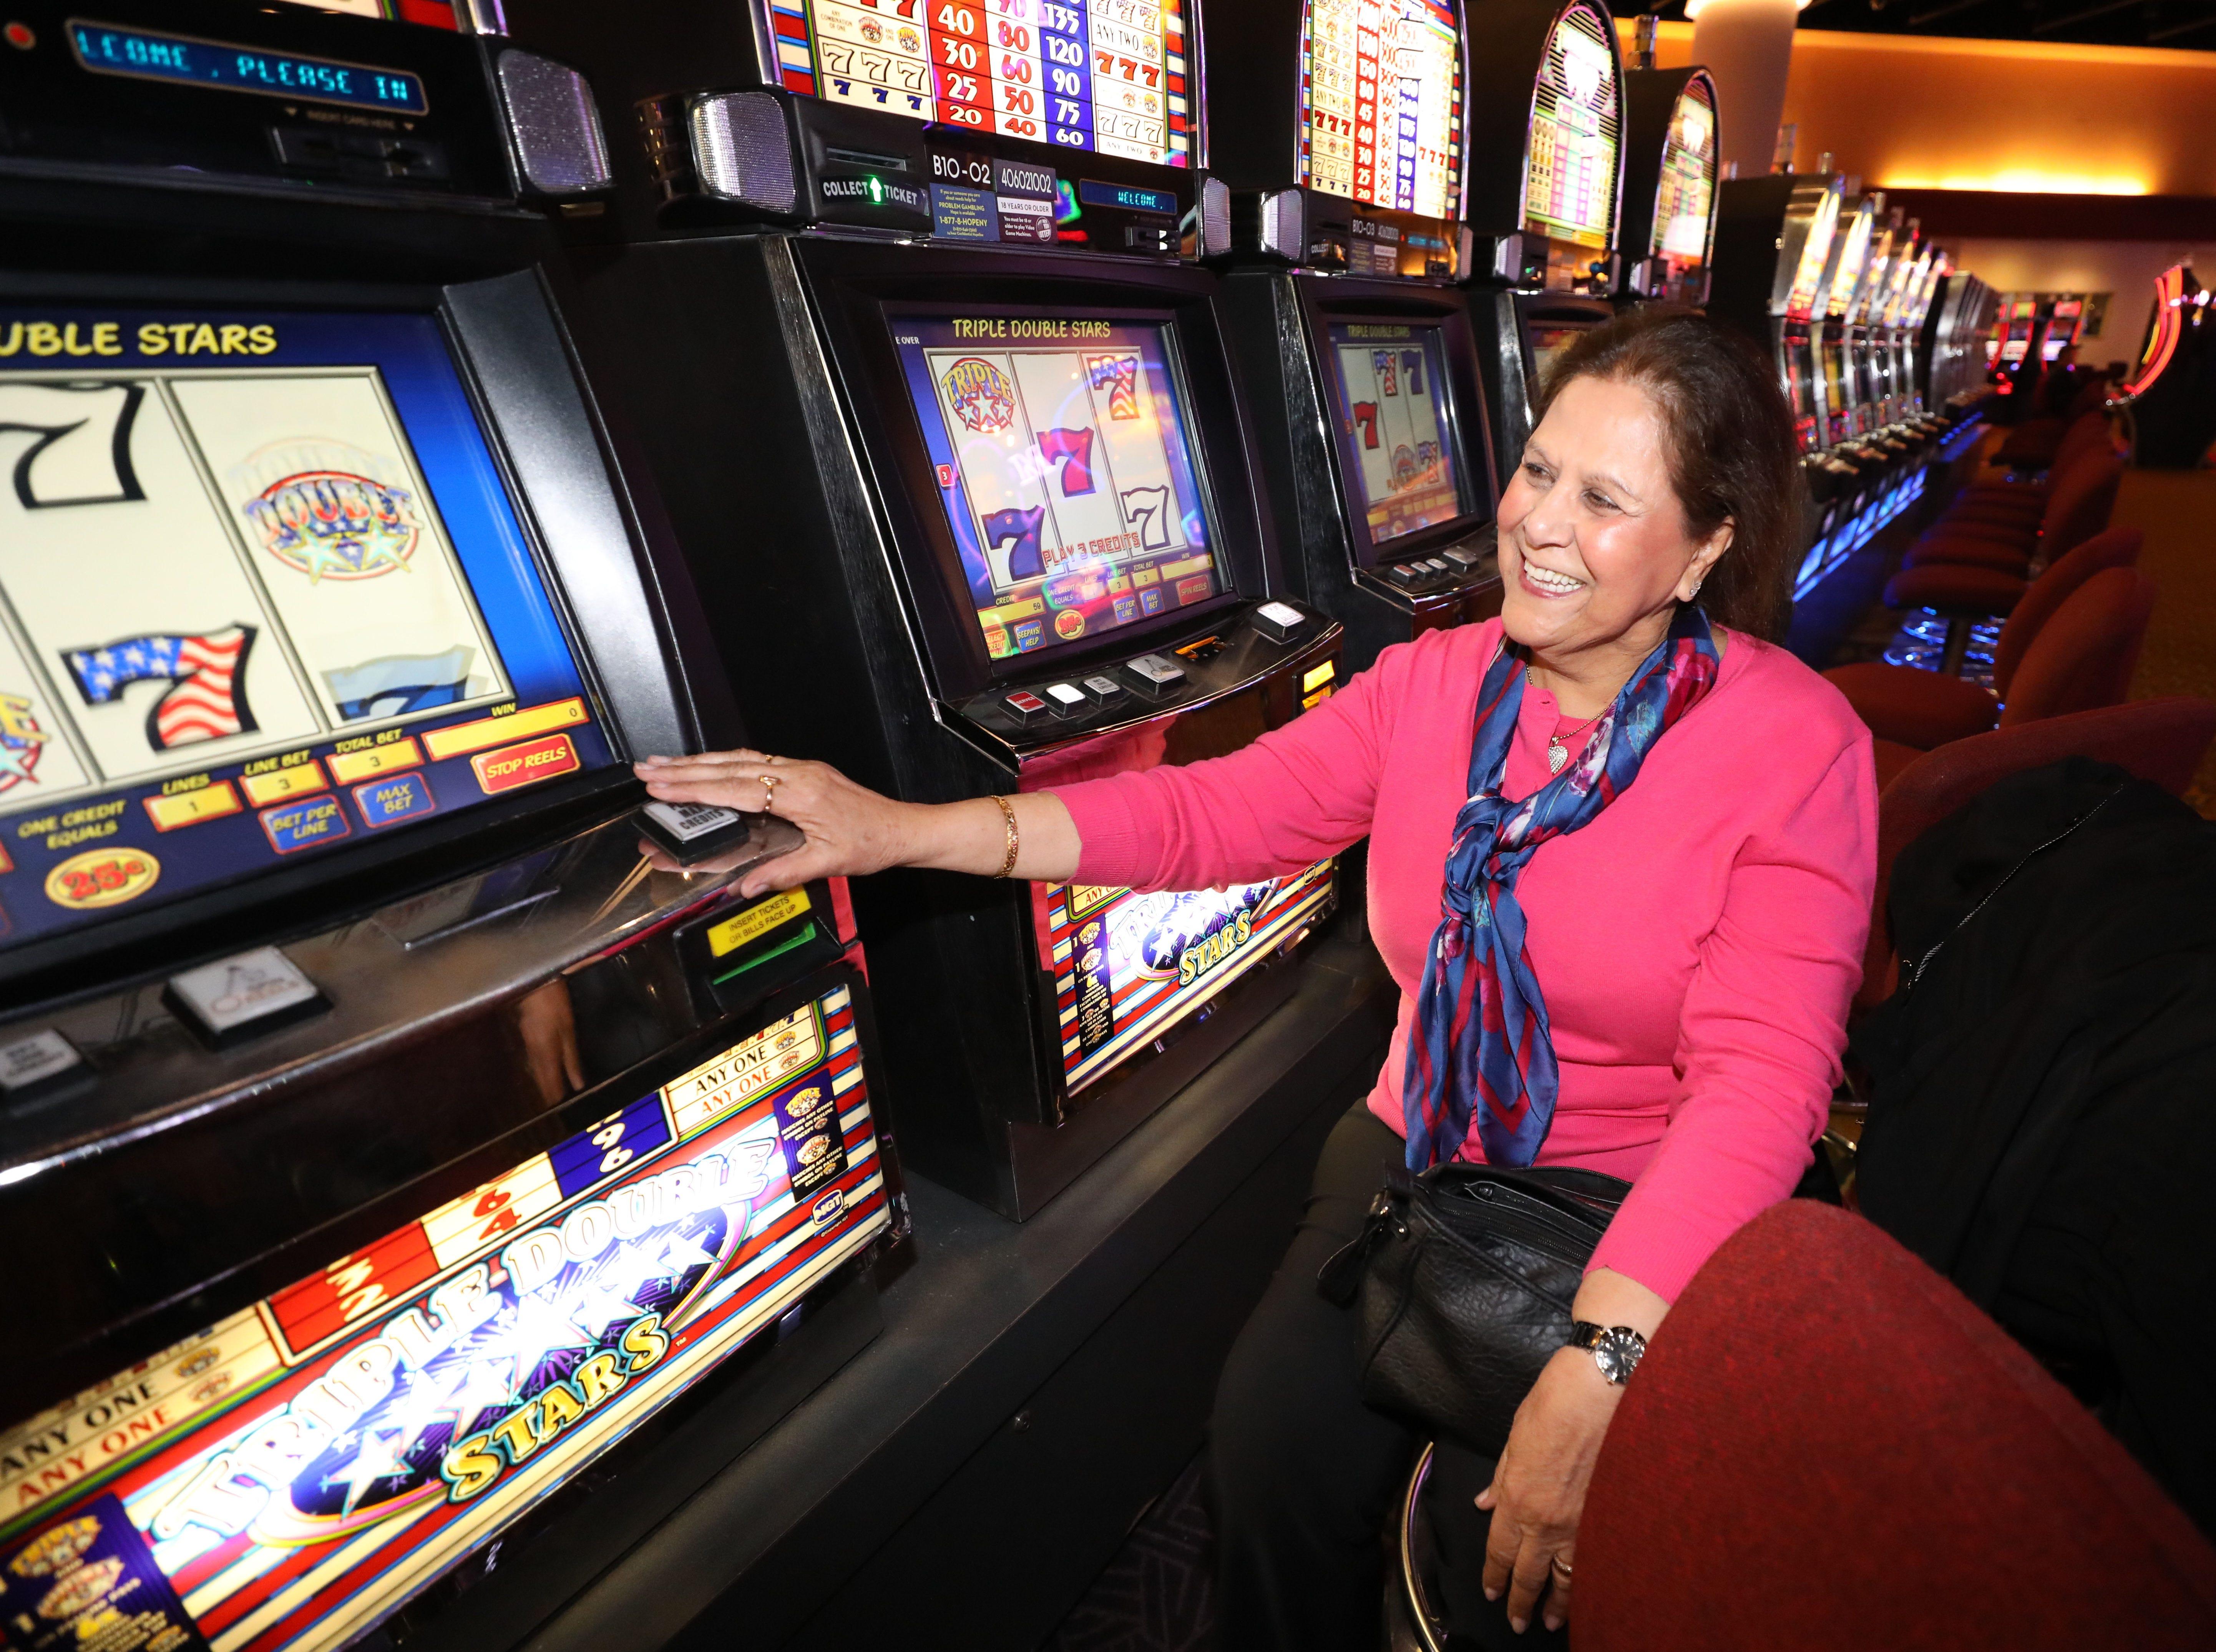 Birinder Singh plays her favorite video slot machine at the Monticello Casino Raceway in Monticello, April 10, 2019.